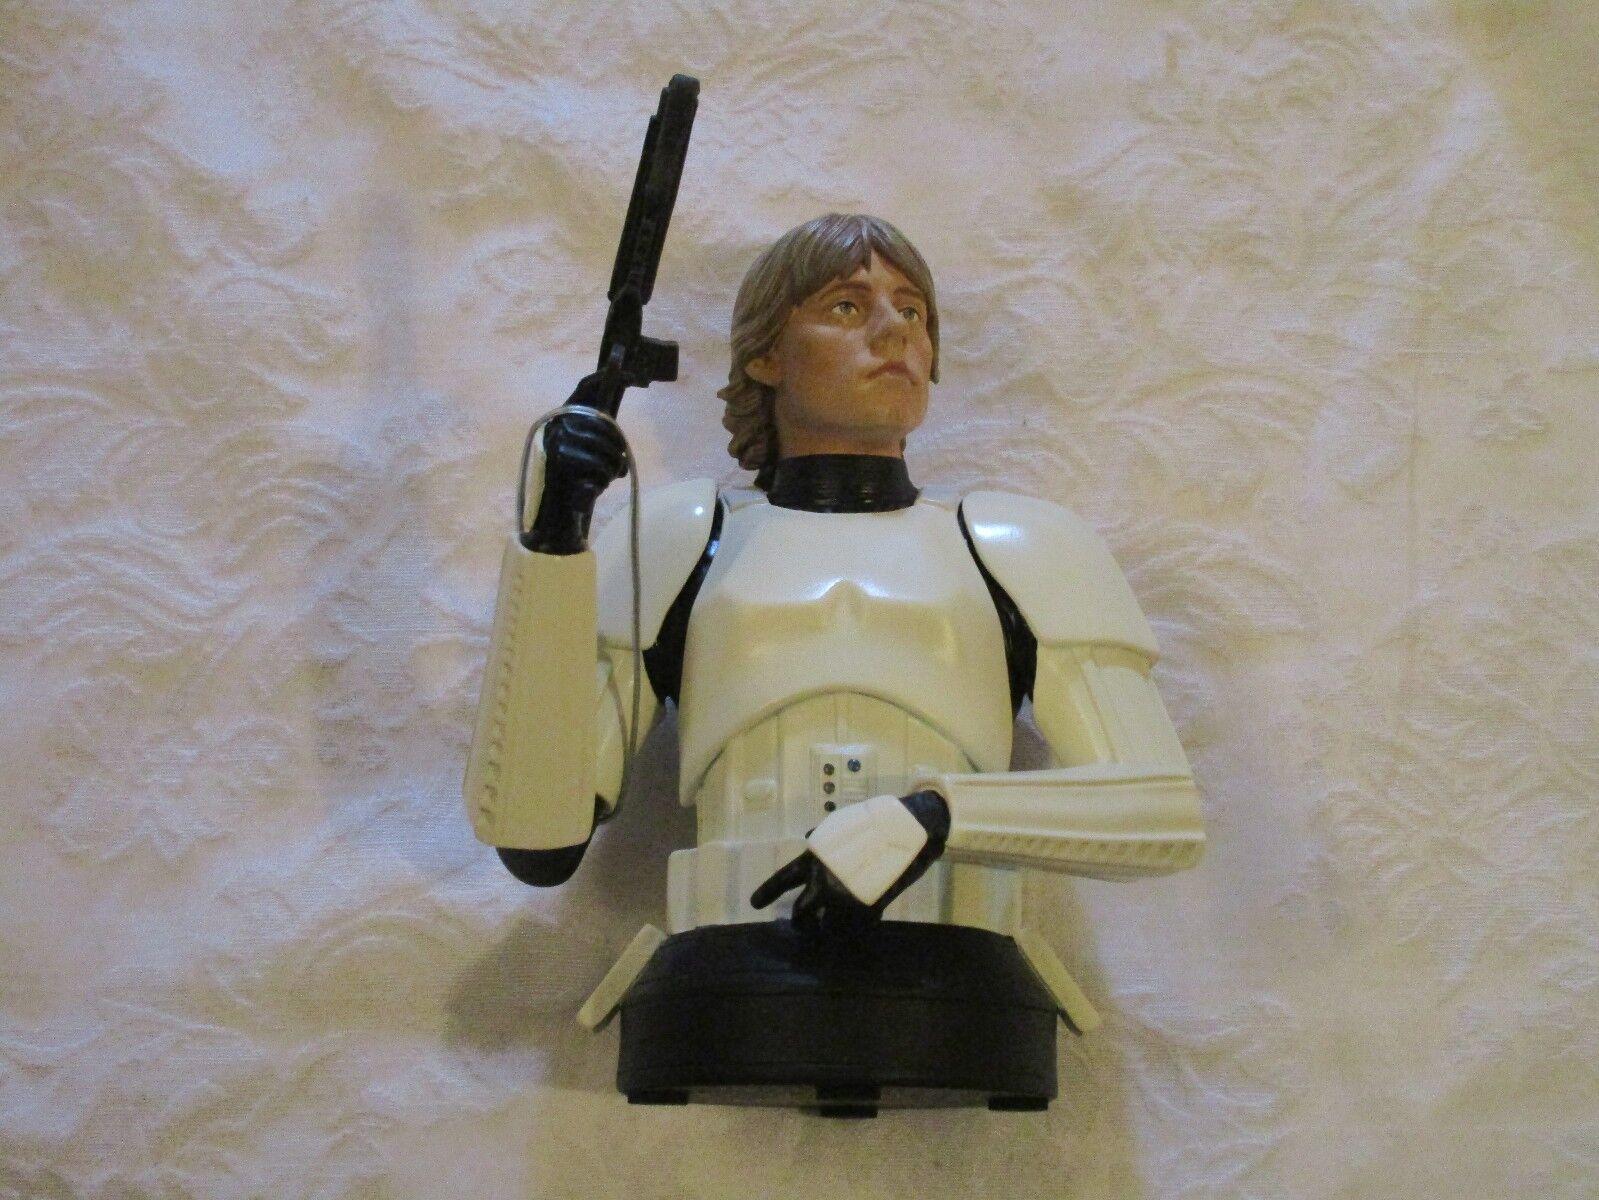 Gentle Giant estrella guerras Luke cielowalker Stormtrooper Disguise autobust  28673500